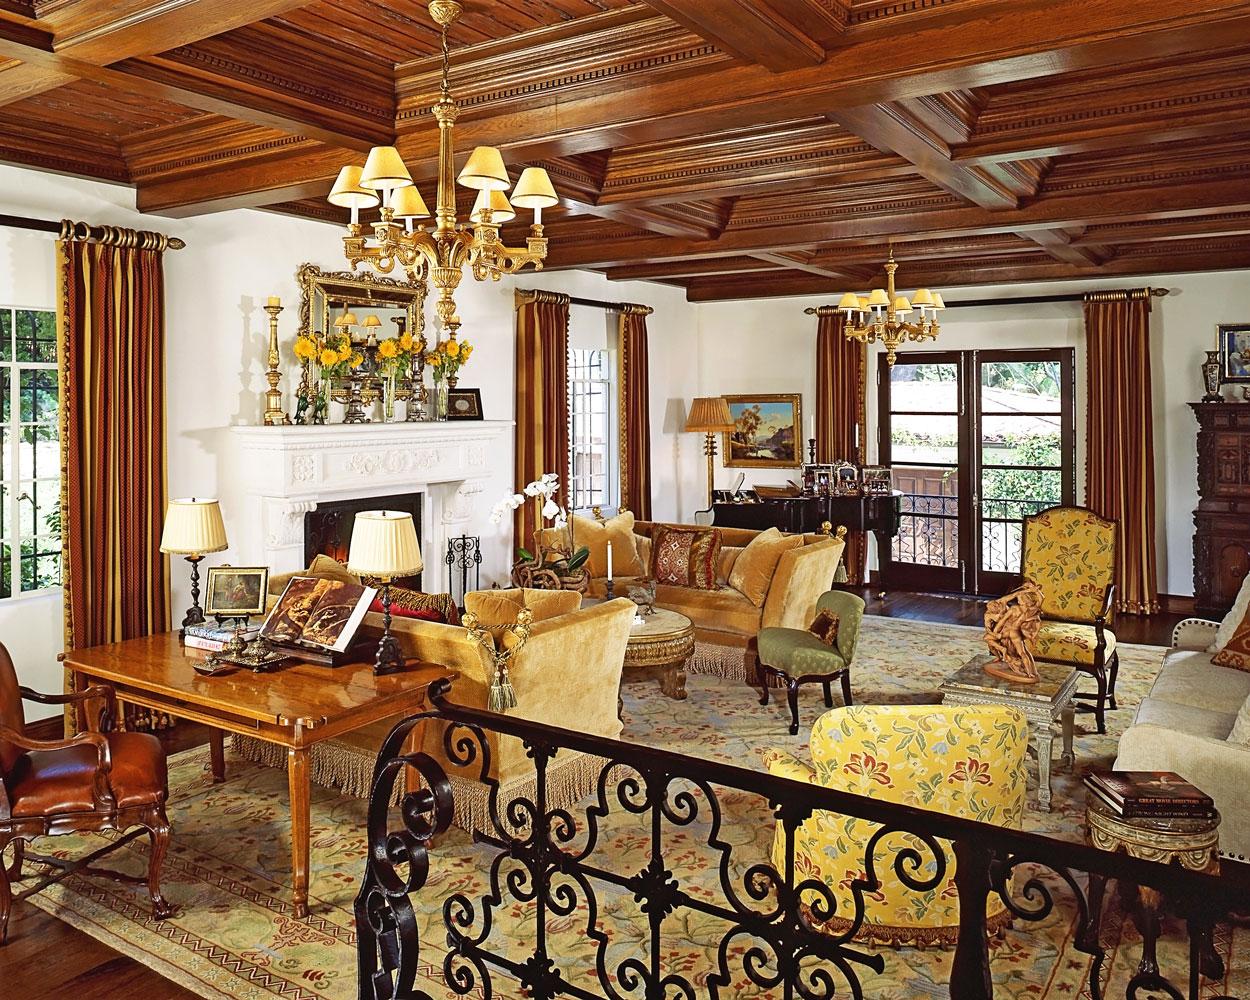 5-living-room-fireplace-dee-carawan.jpg